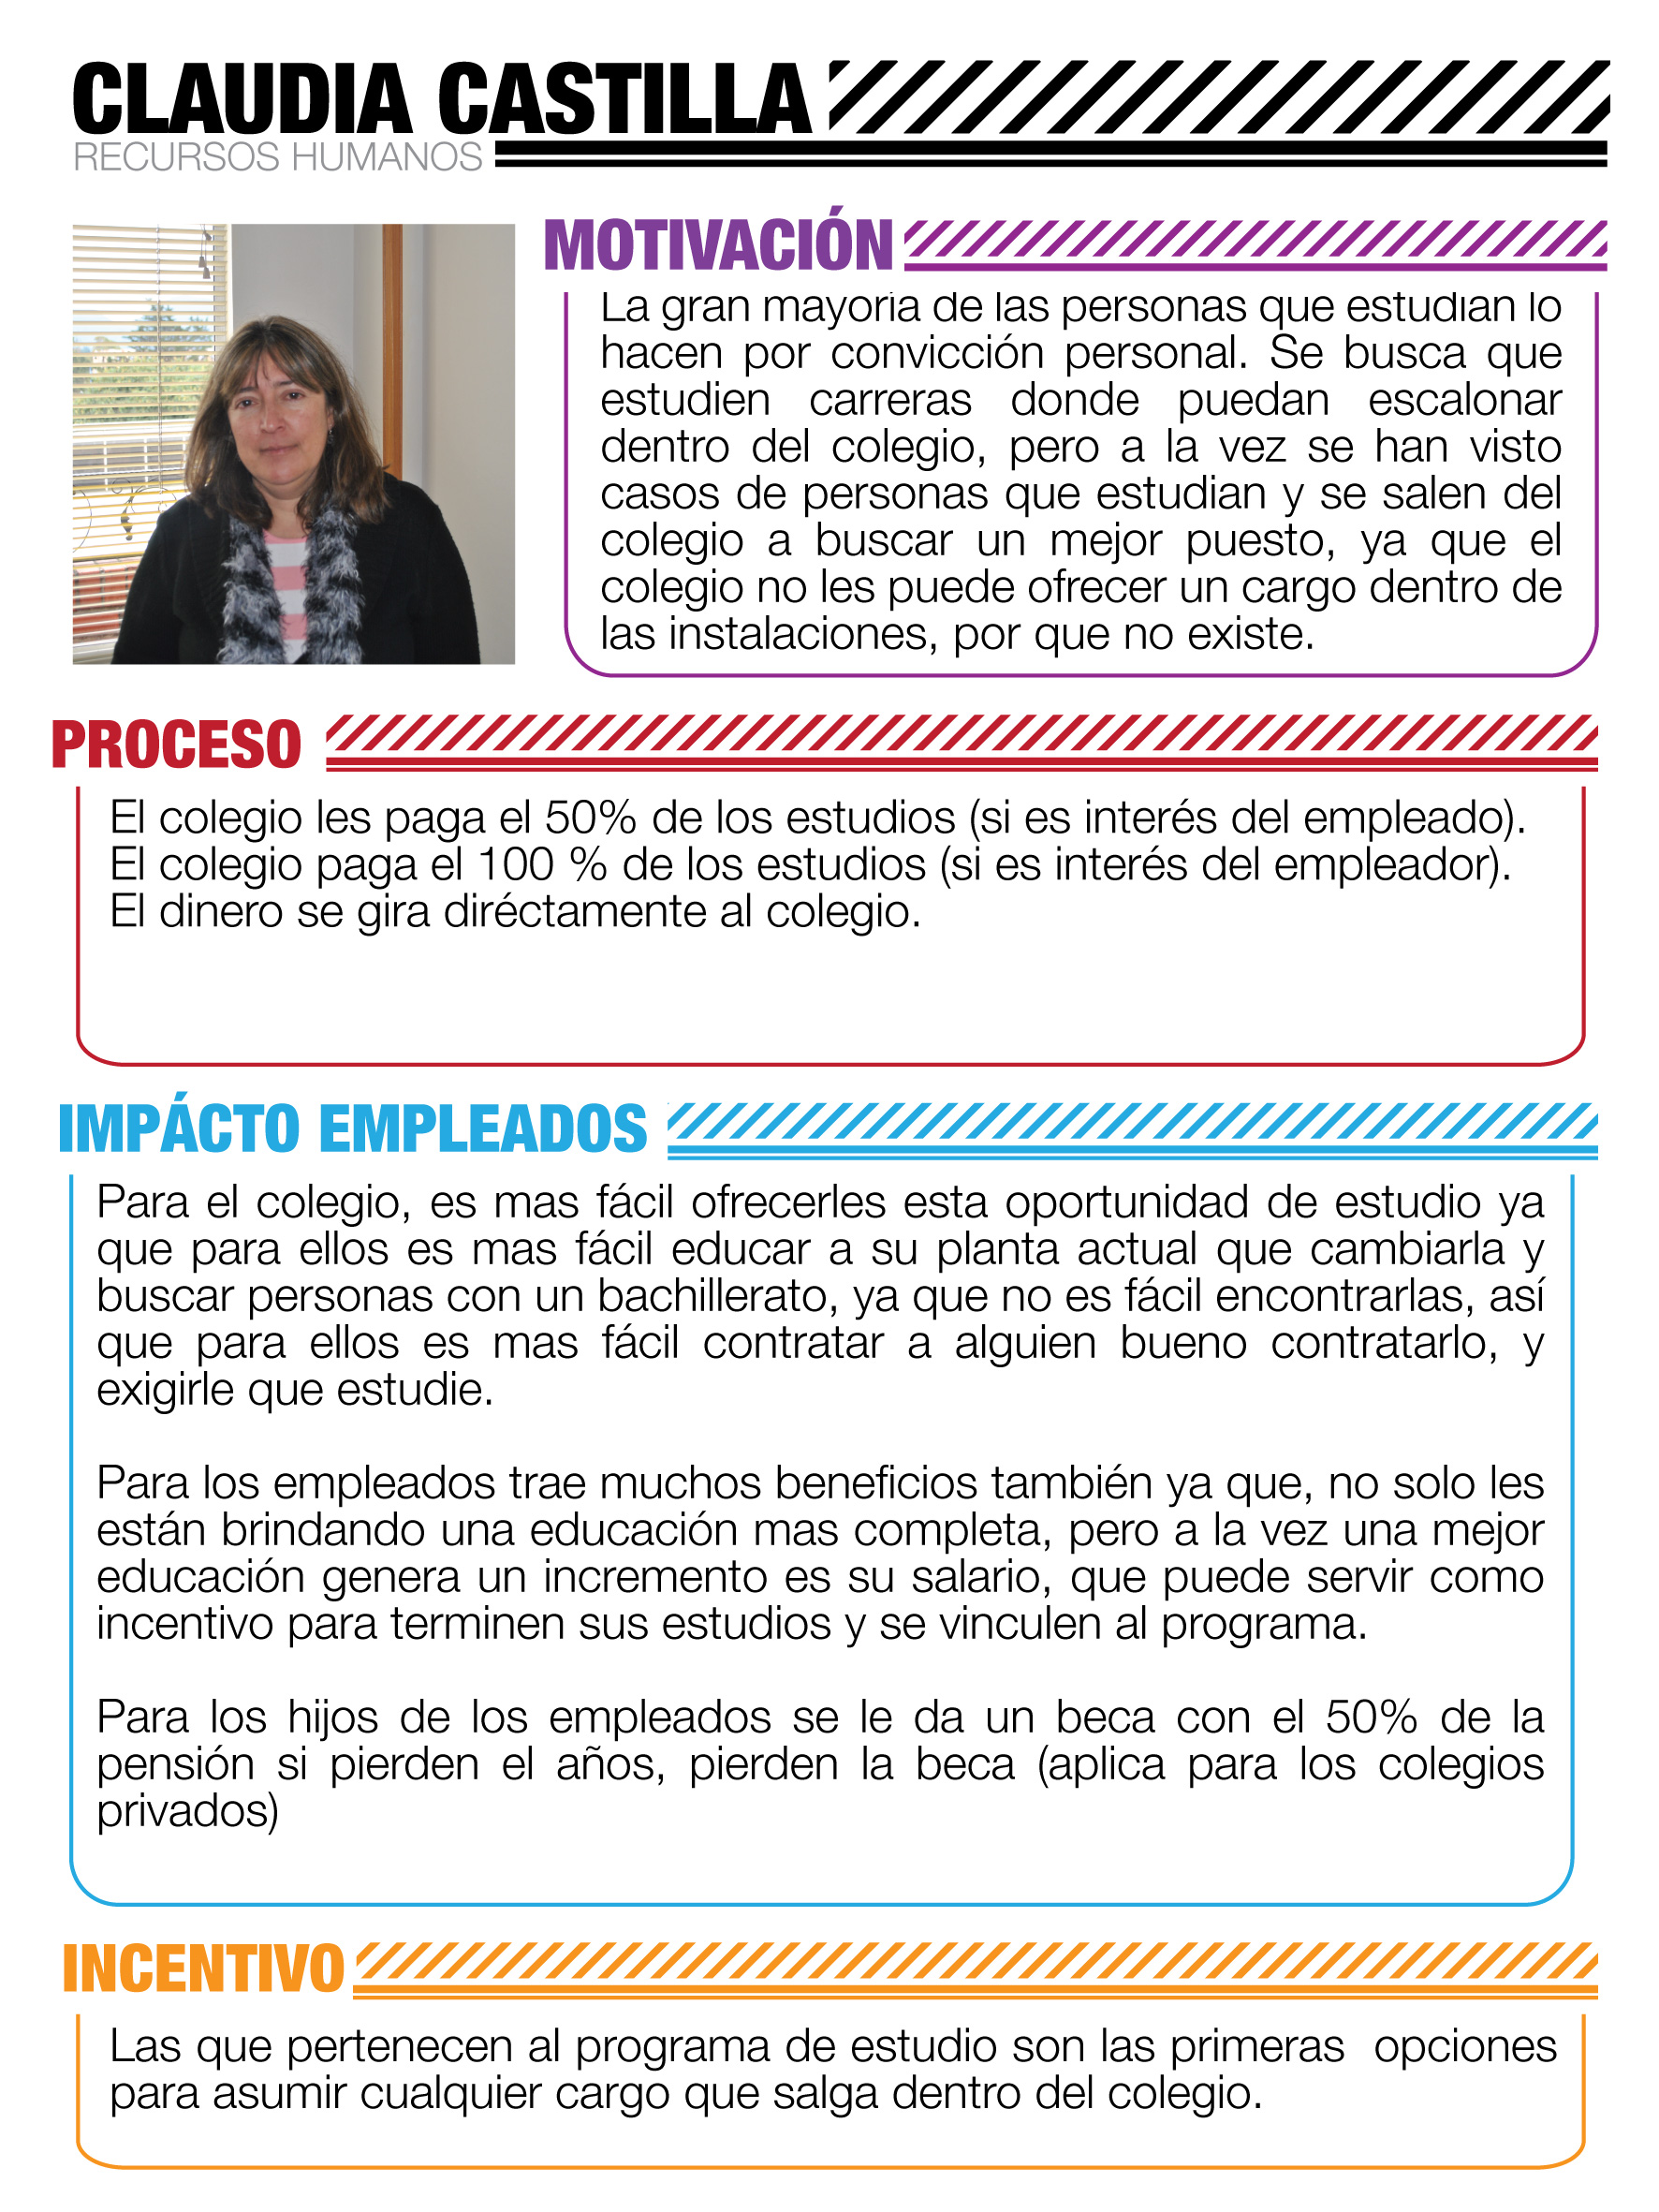 Claudia Castilla